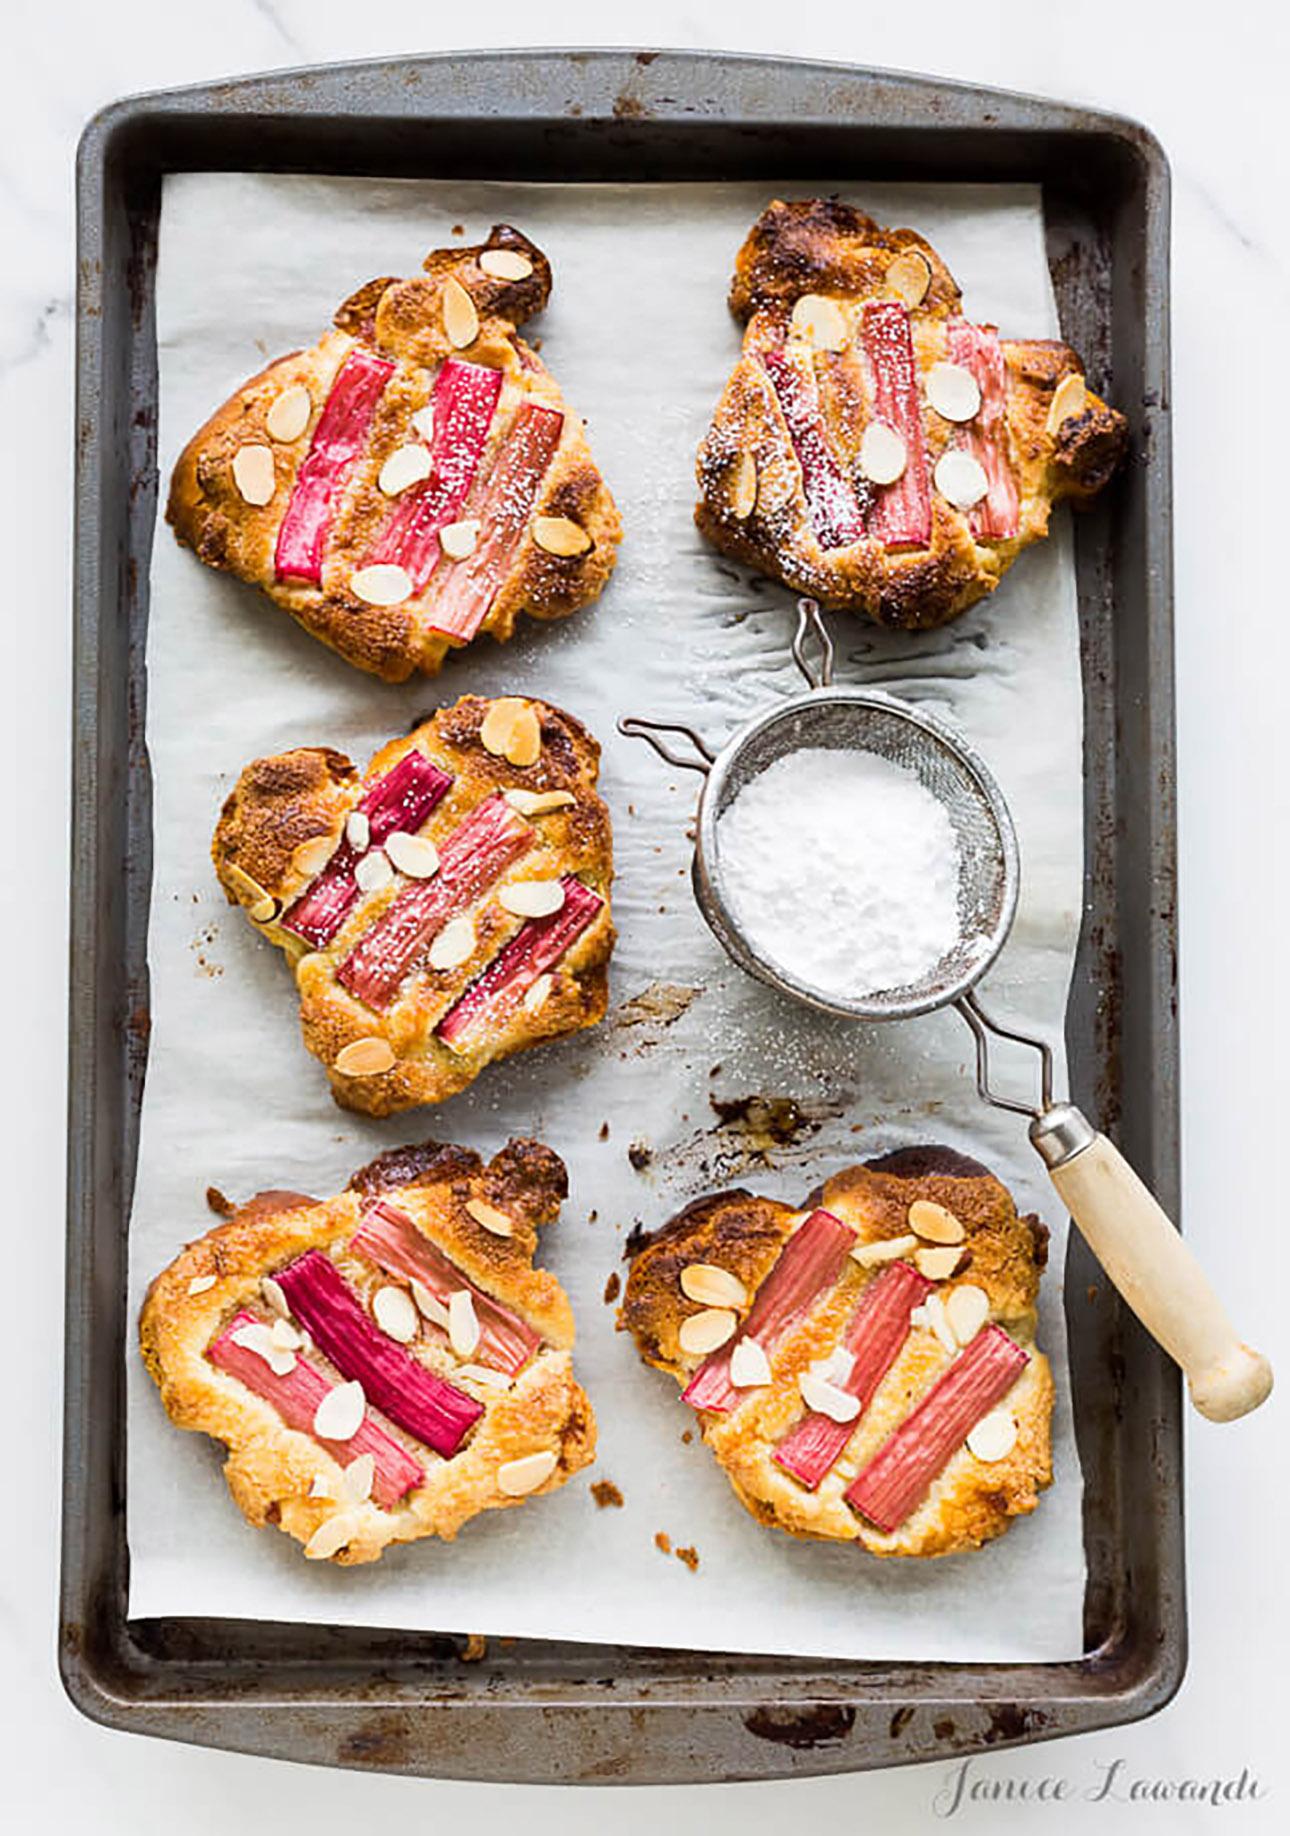 Rhubarb Bostock by The Bake School // 15 Rhubarb Dessert Recipes for Spring